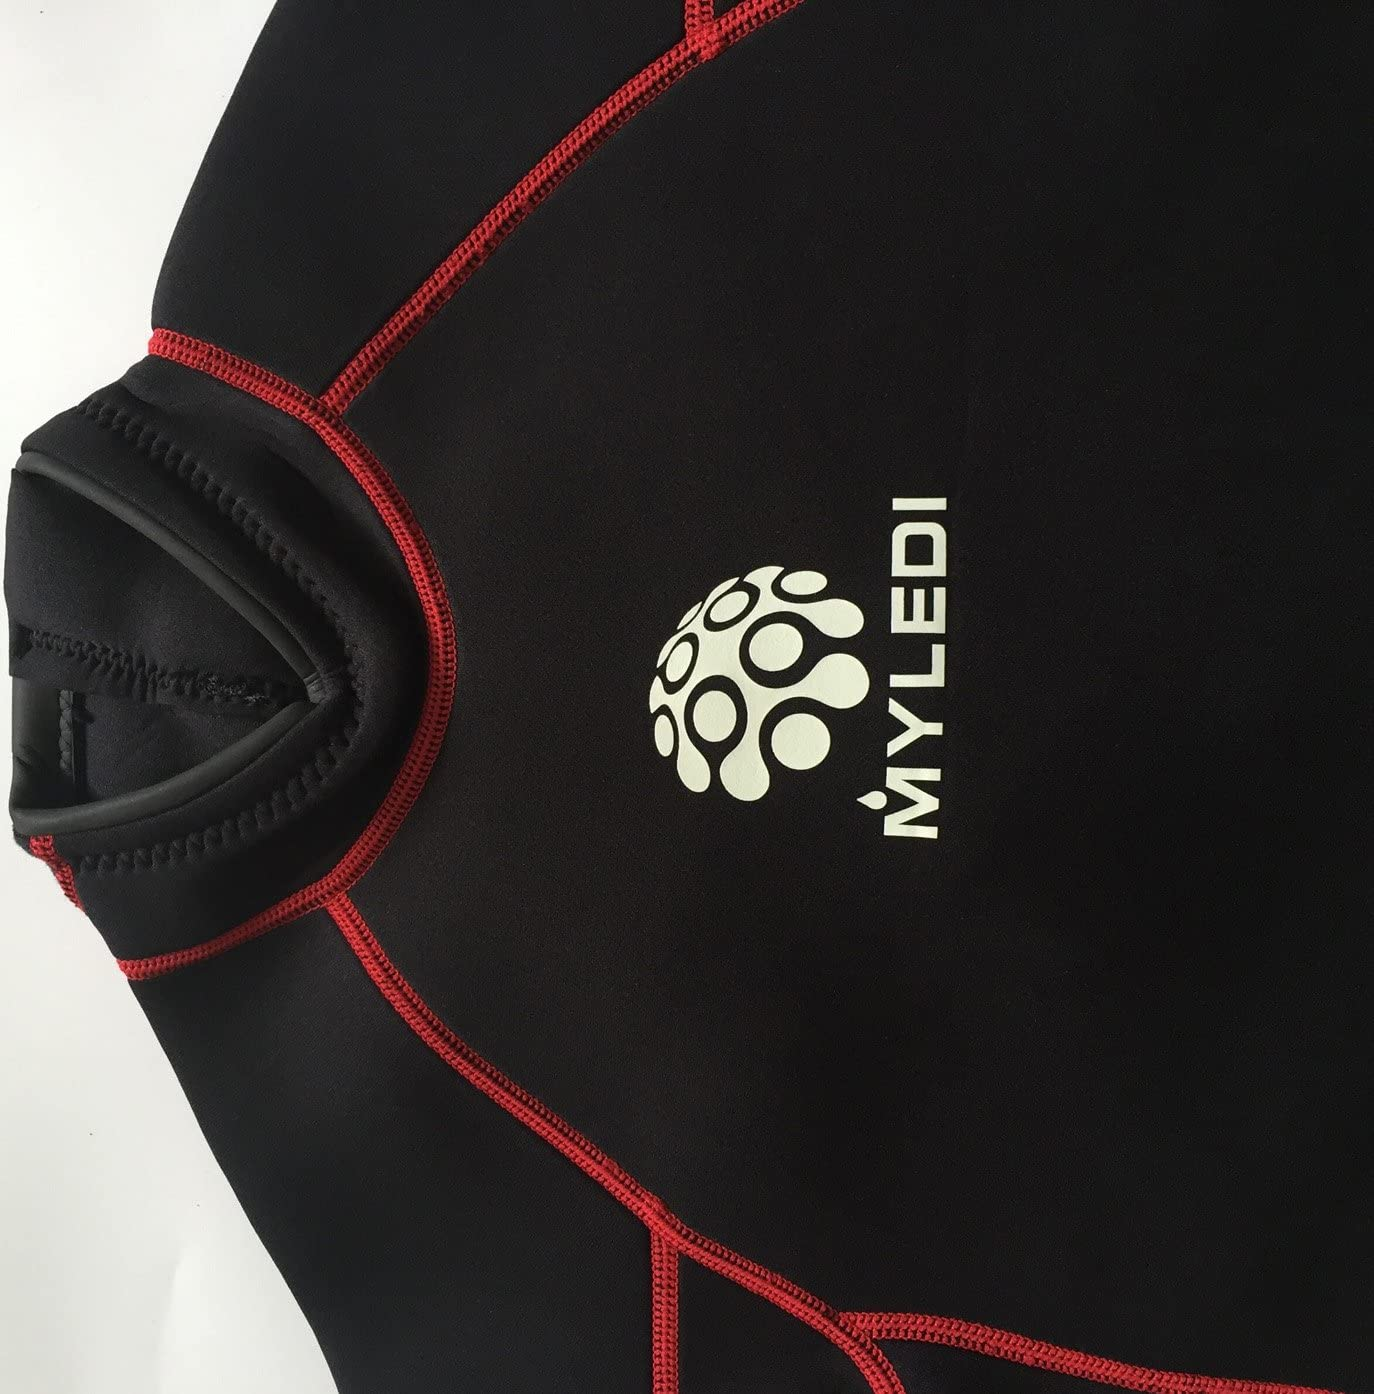 MYLEDI 3mm Neoprene Full Body Surfing and Diving Suit Mens Wetsuit